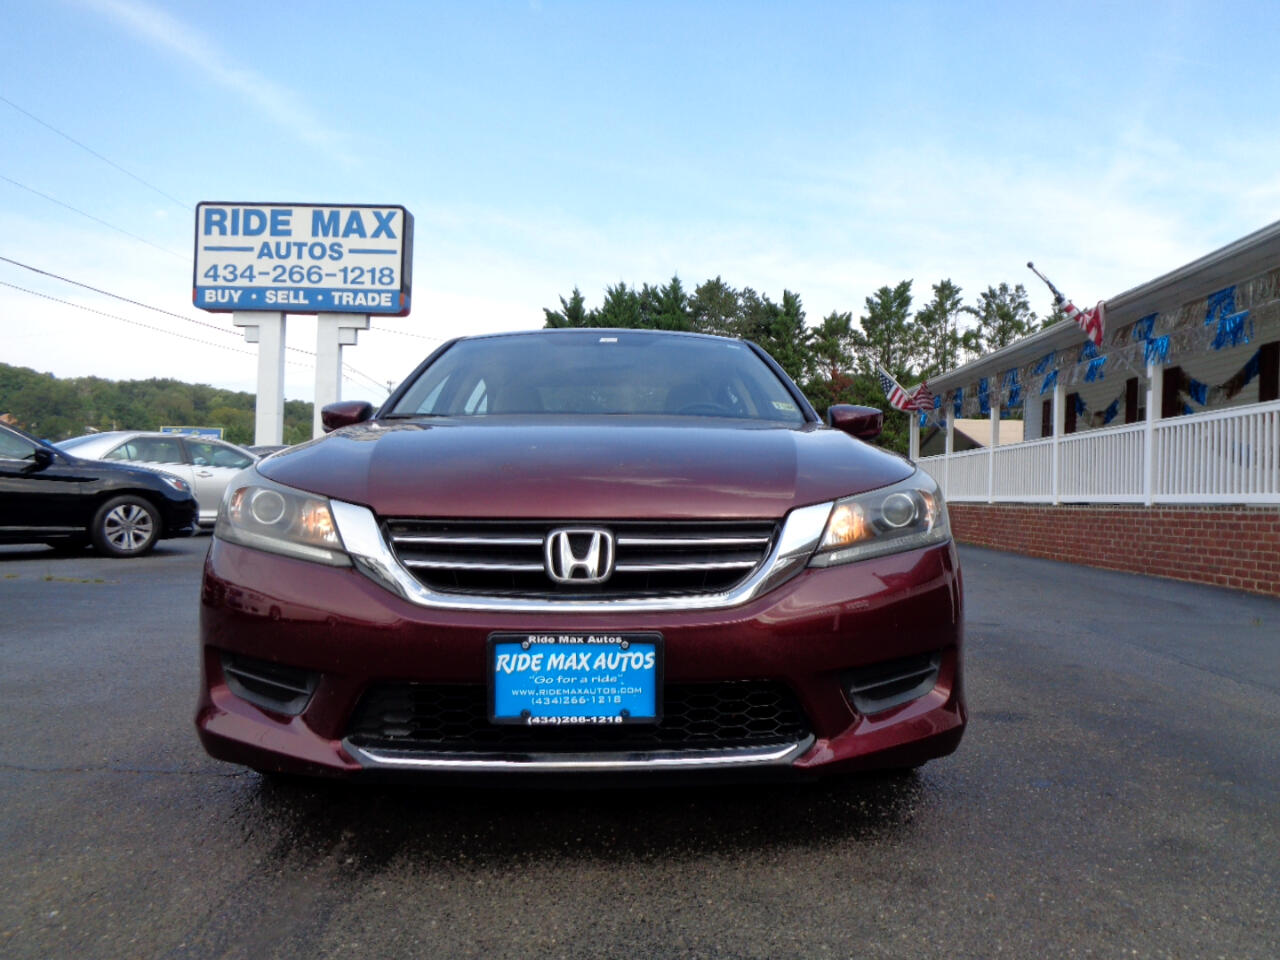 Honda Accord Sdn 4dr I4 CVT LX 2013